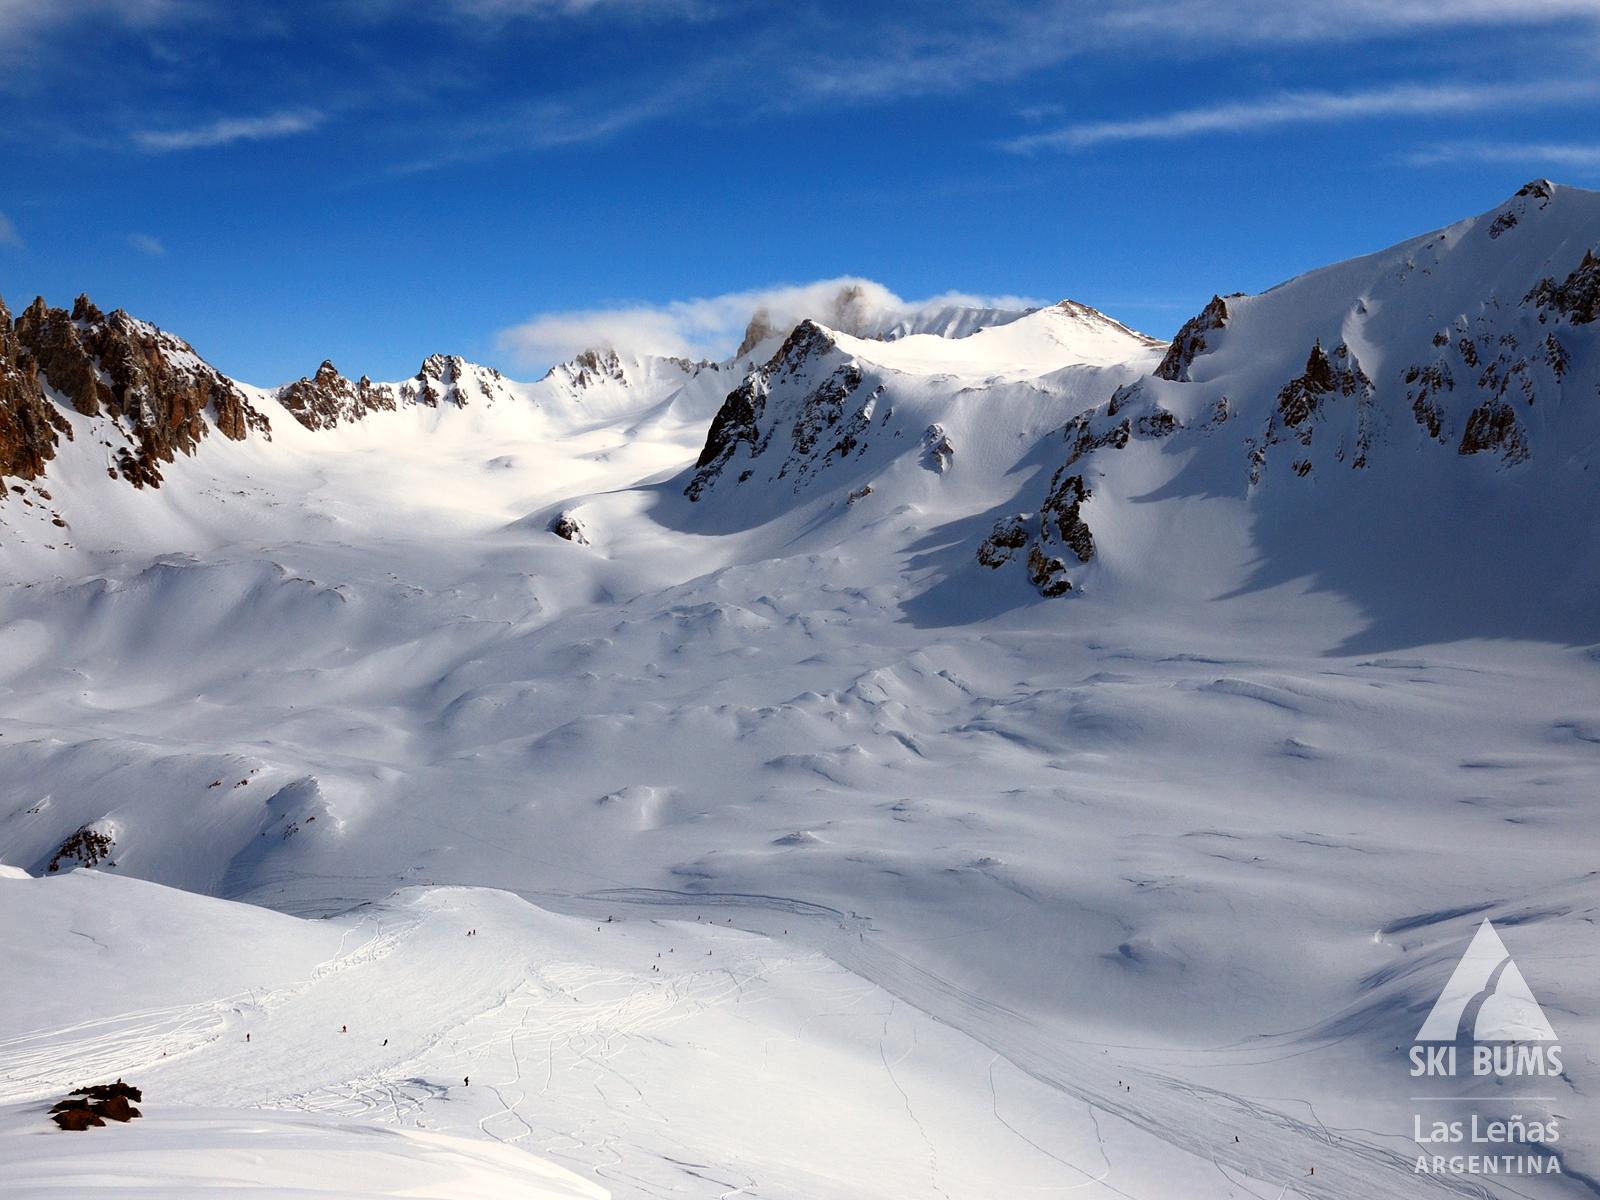 Ski Bums Gay Amp Lesbian Skiing And Snowboarding Club Photo 1600x1200